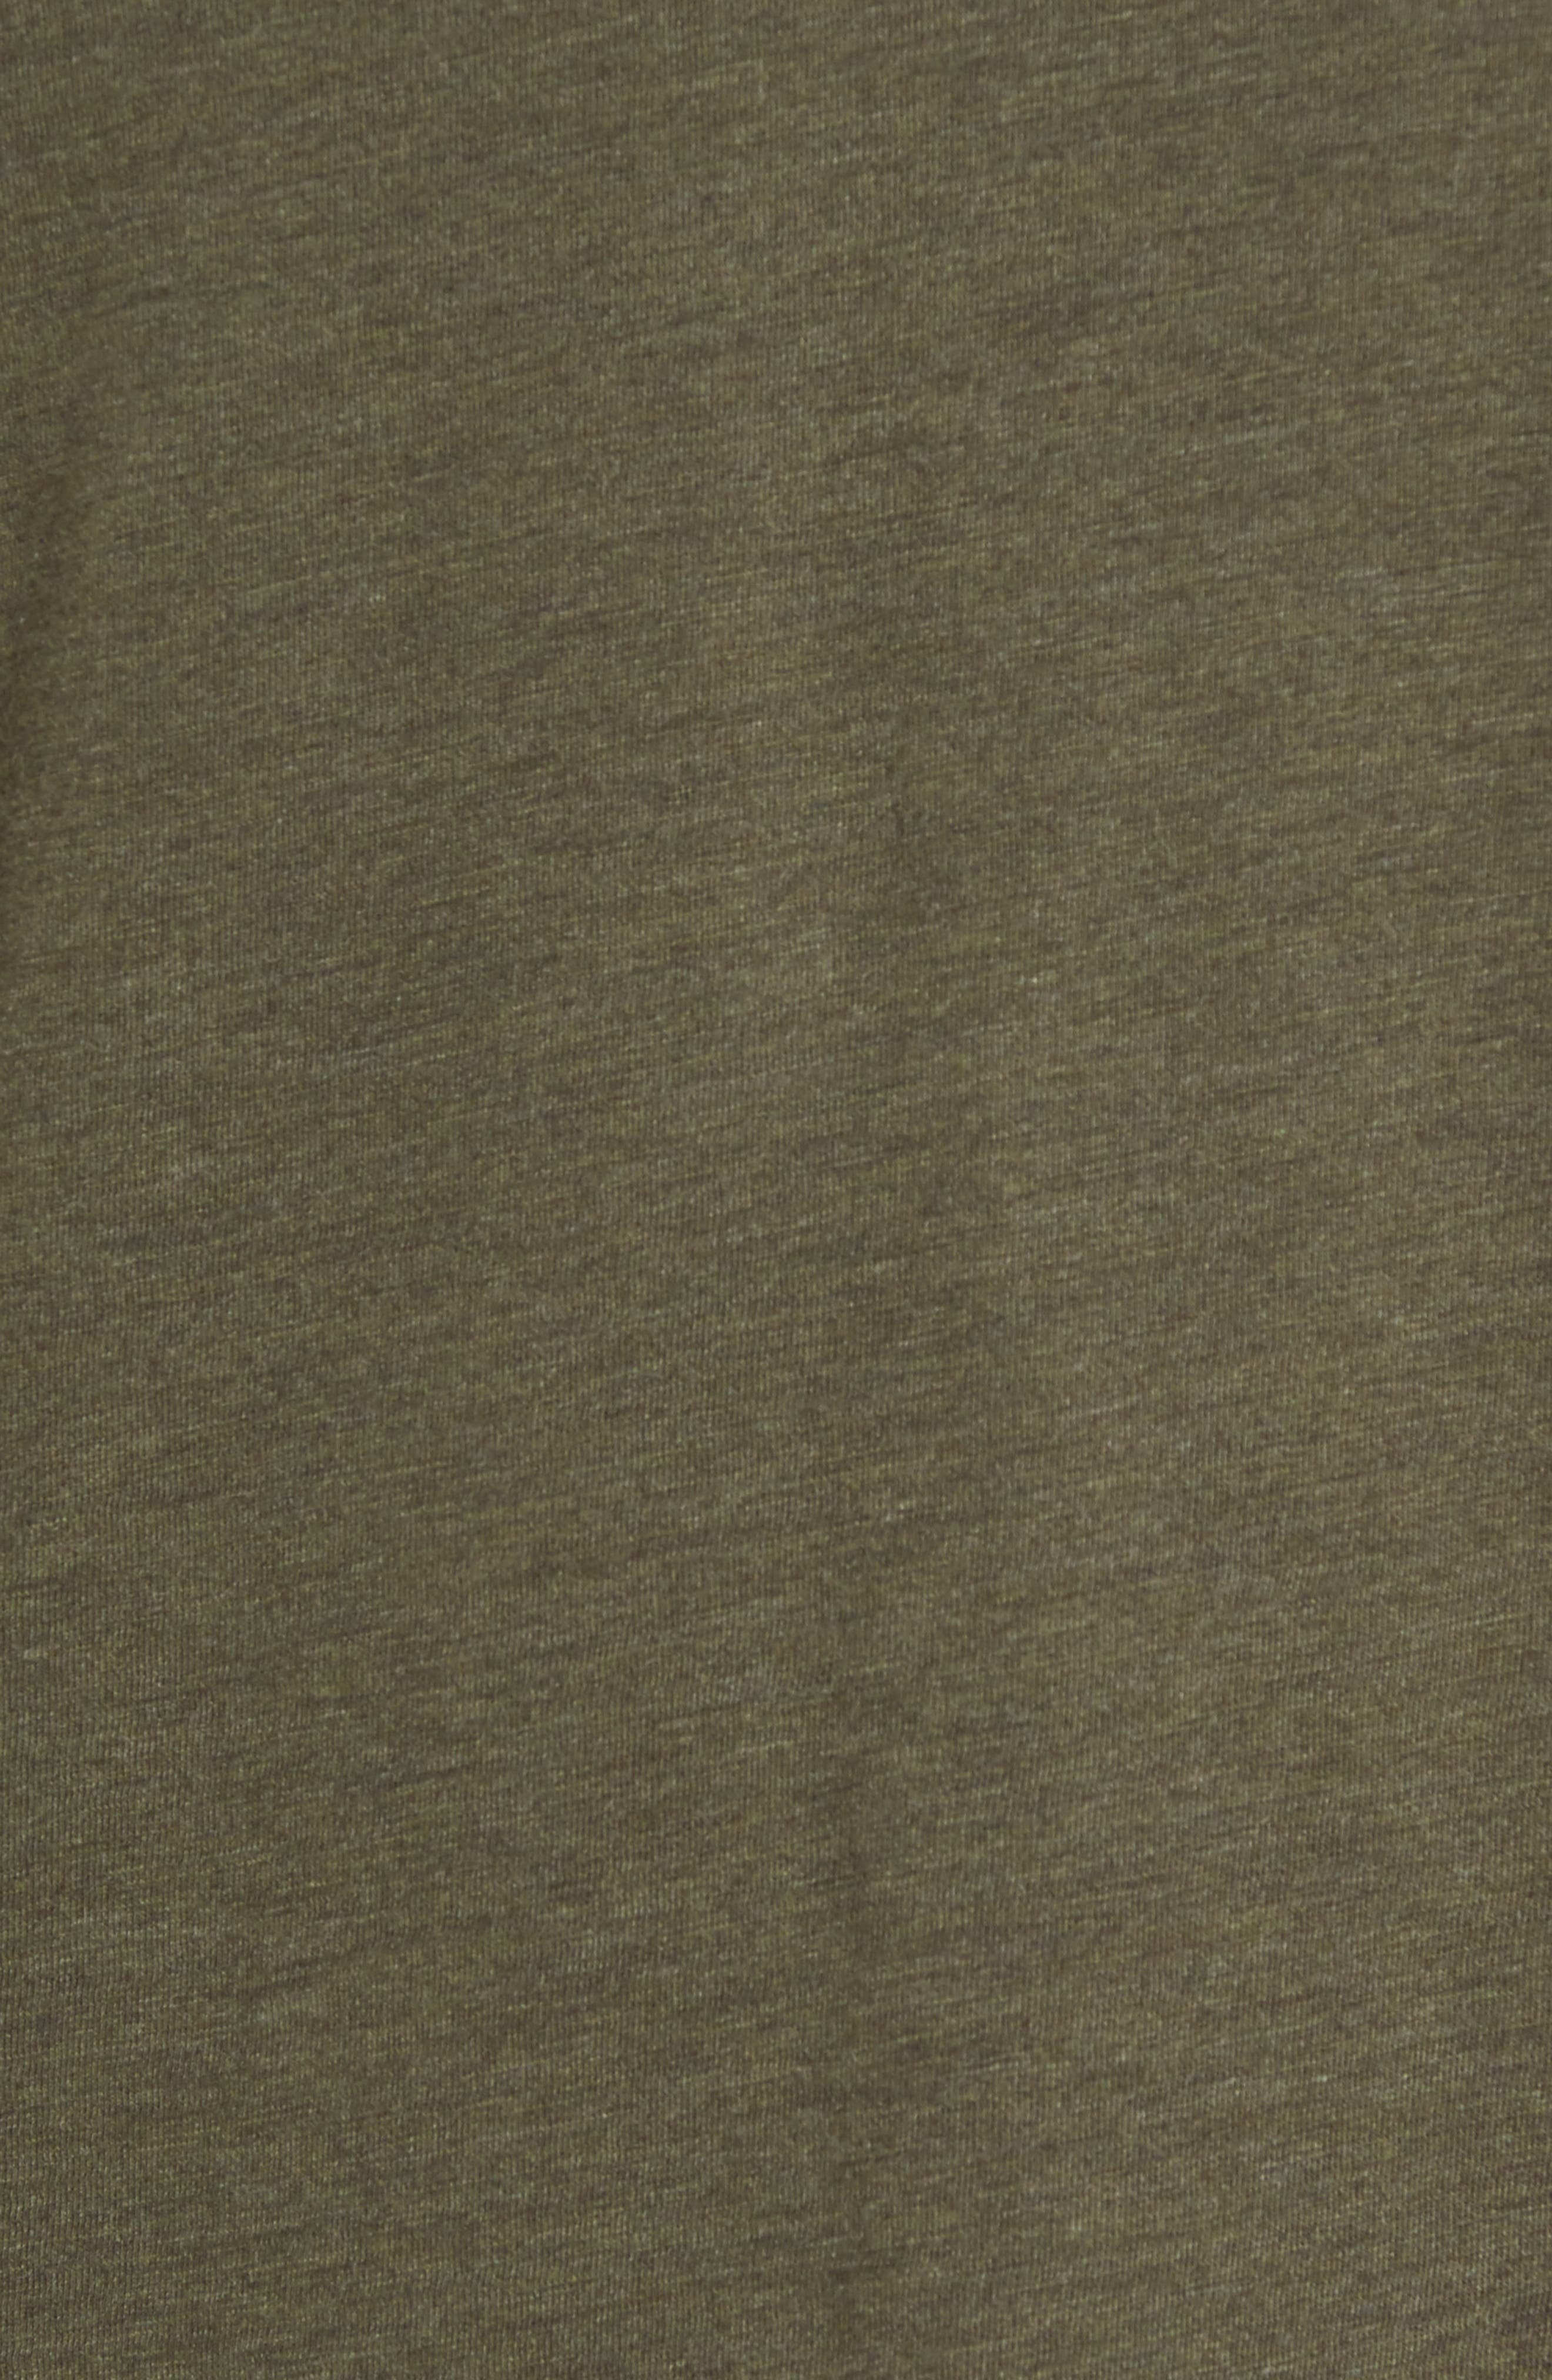 Bing Short Sleeve Henley Shirt,                             Alternate thumbnail 5, color,                             Forest Night